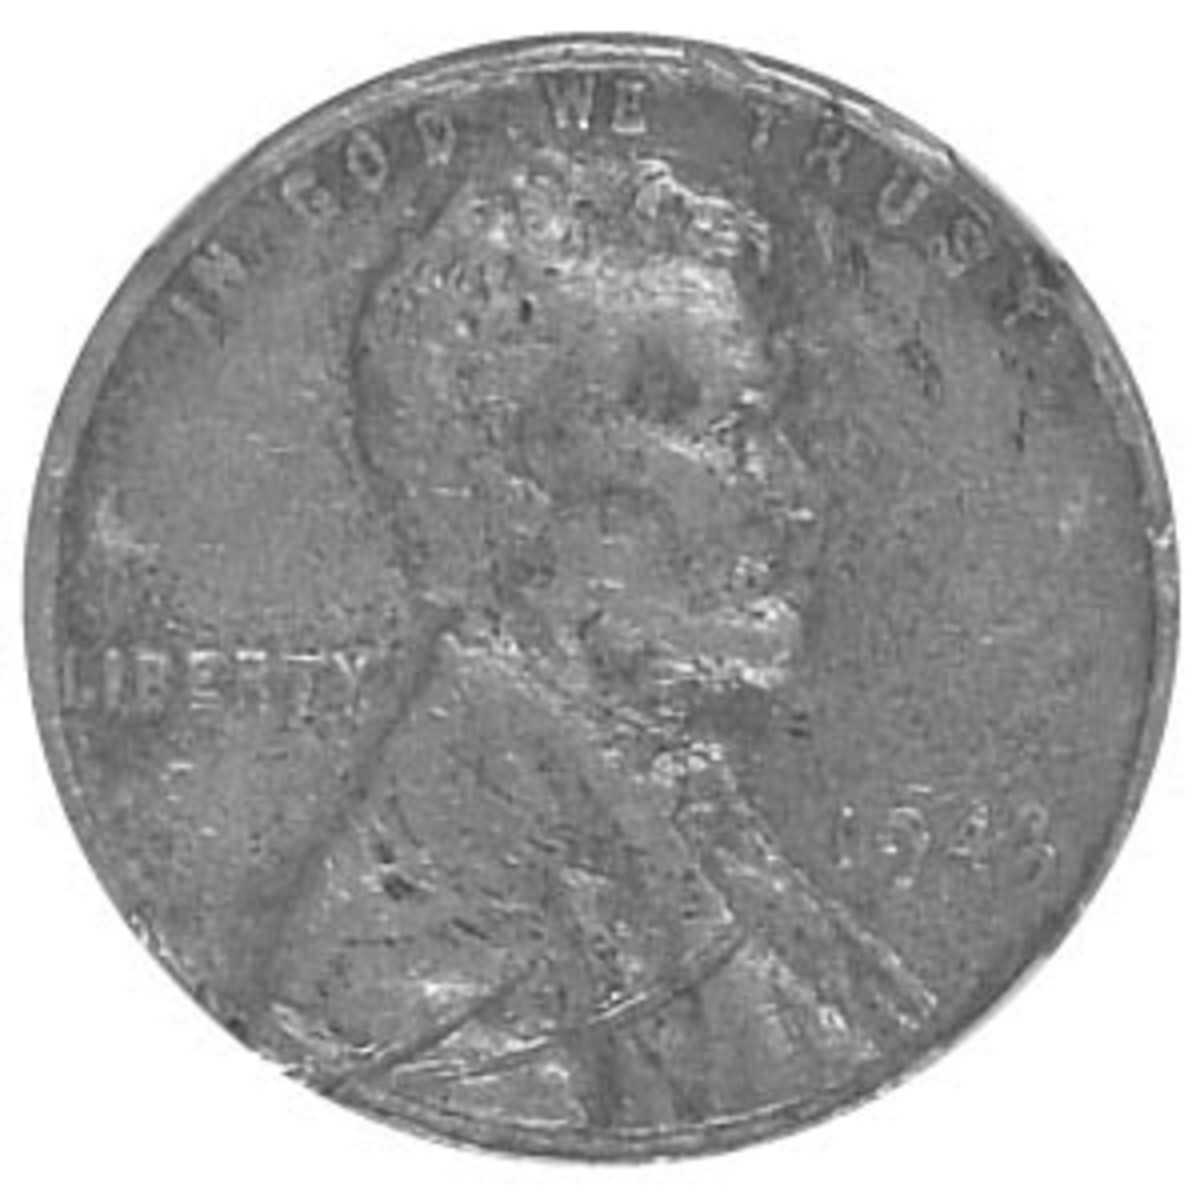 1943 tin alloy Lincoln cent